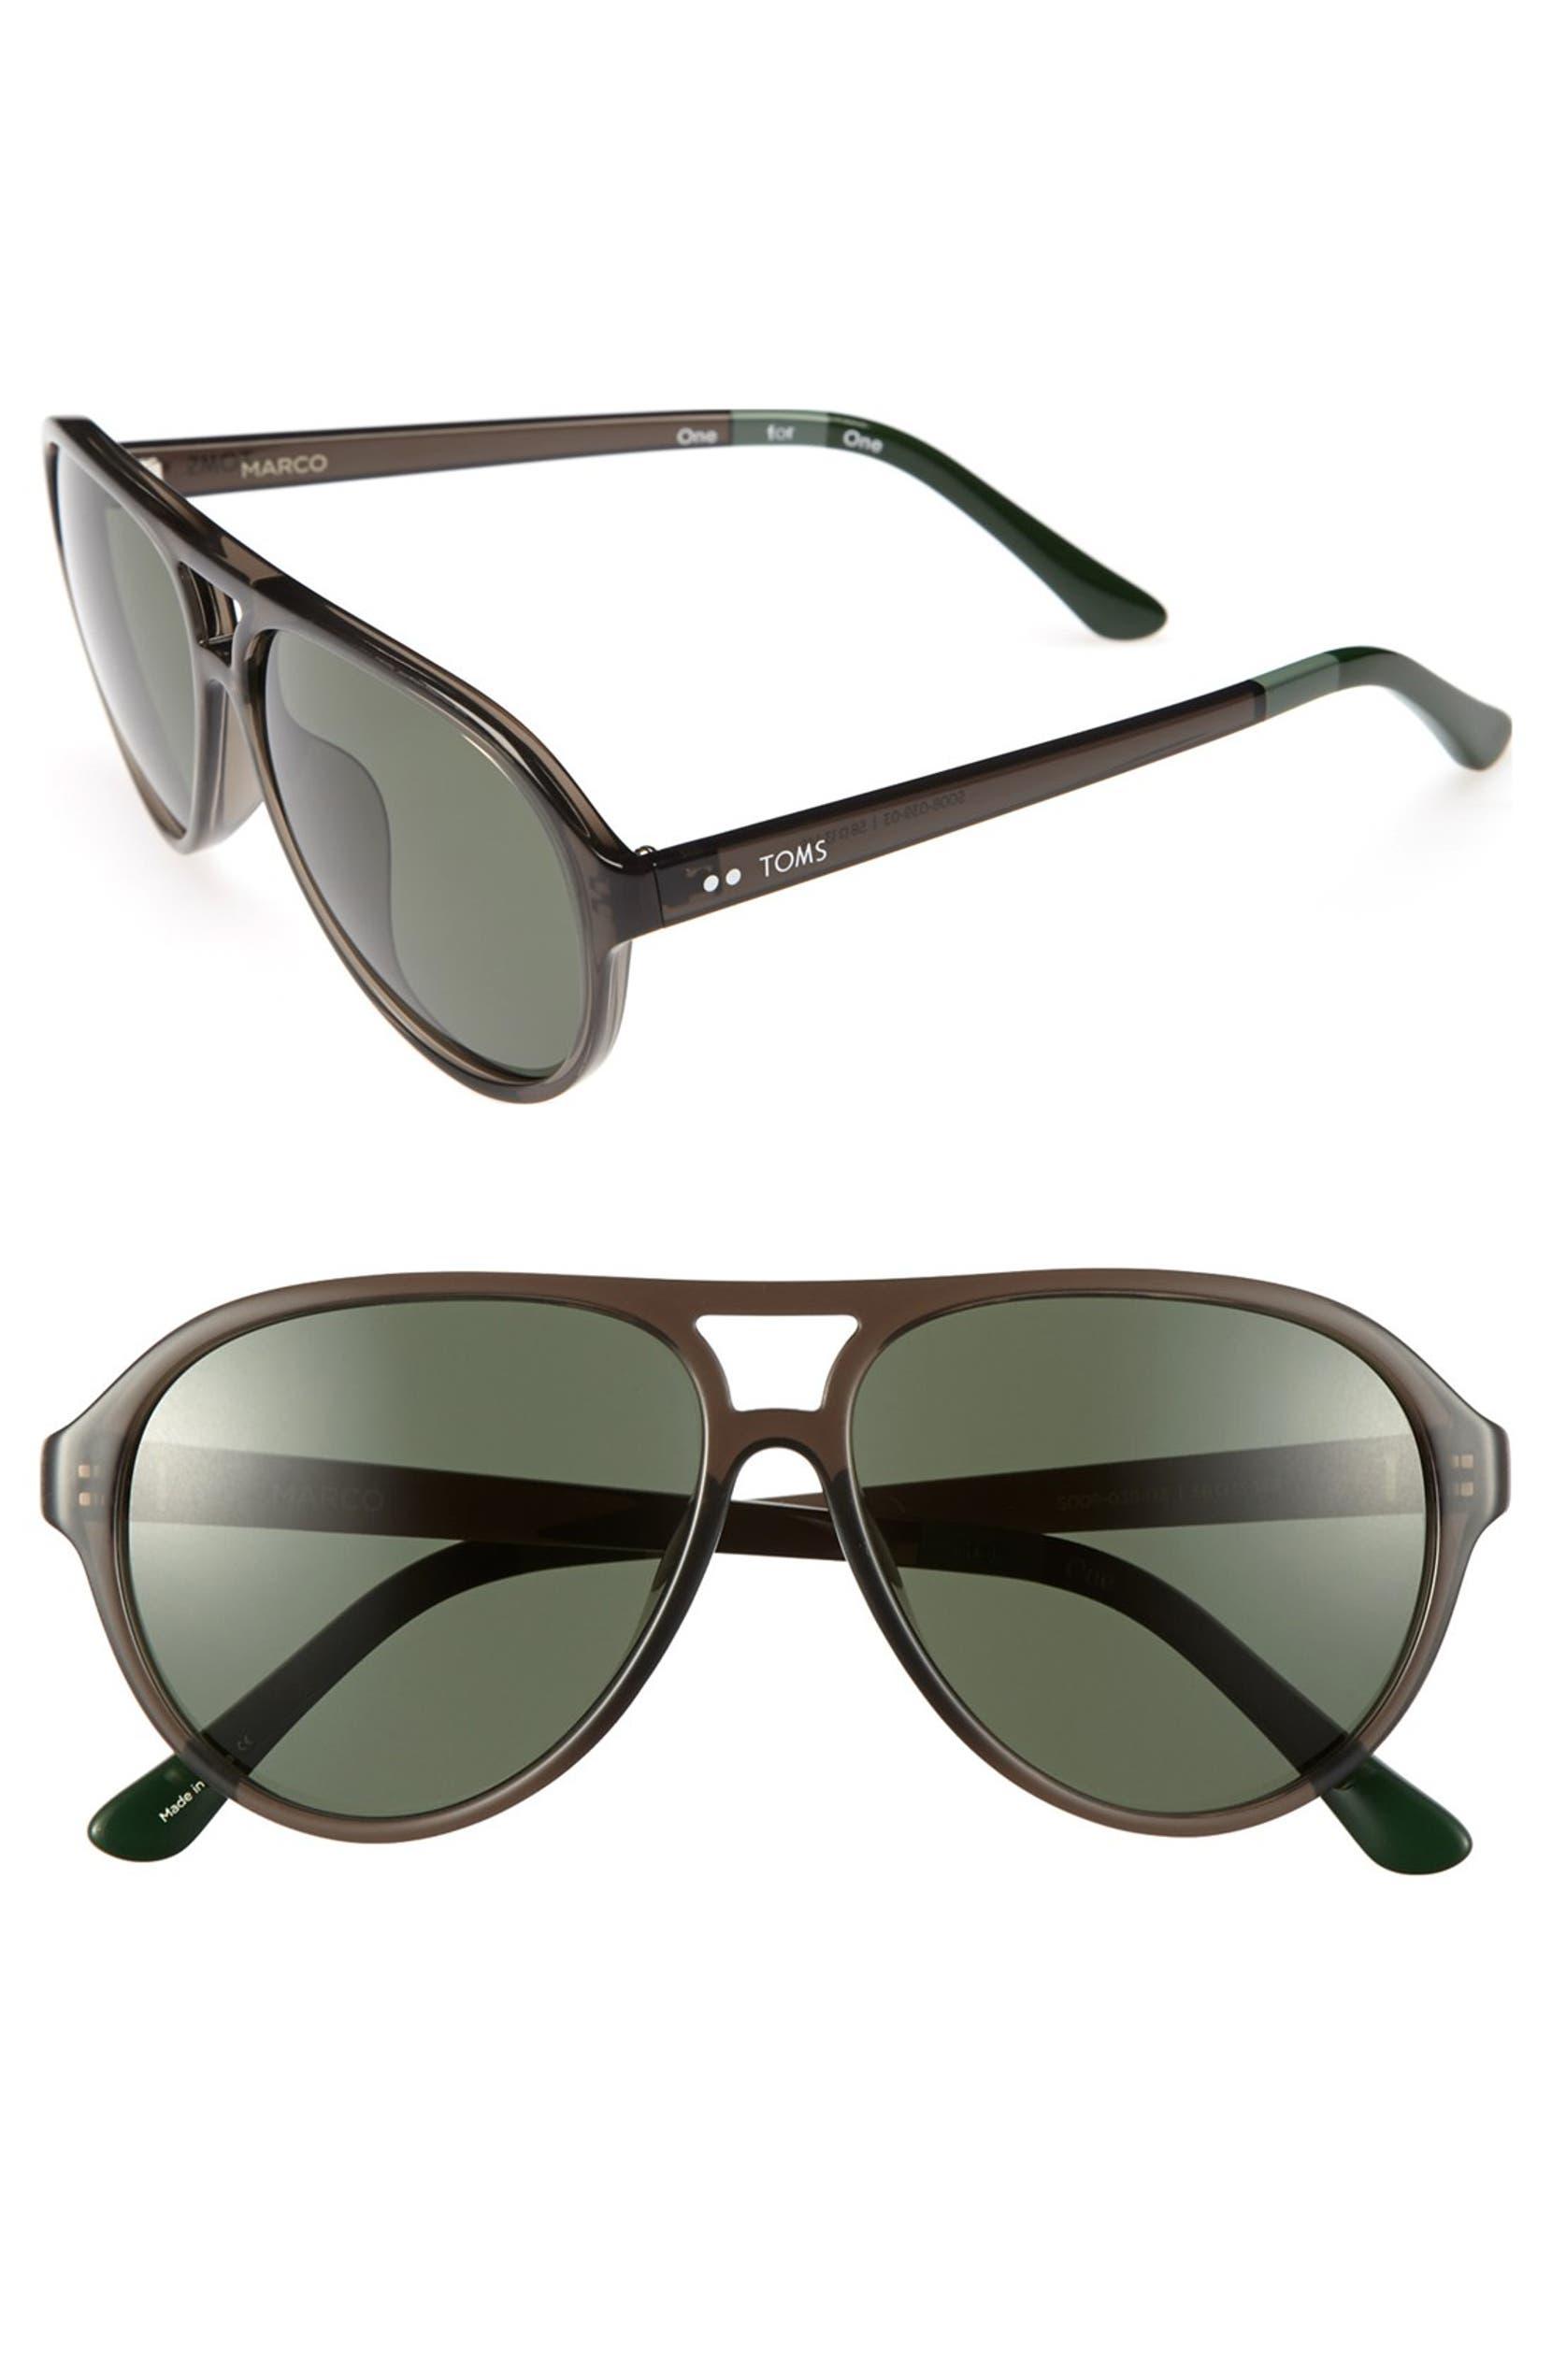 2dbc8dfd6592 TOMS 'Marco' 58mm Sunglasses | Nordstrom